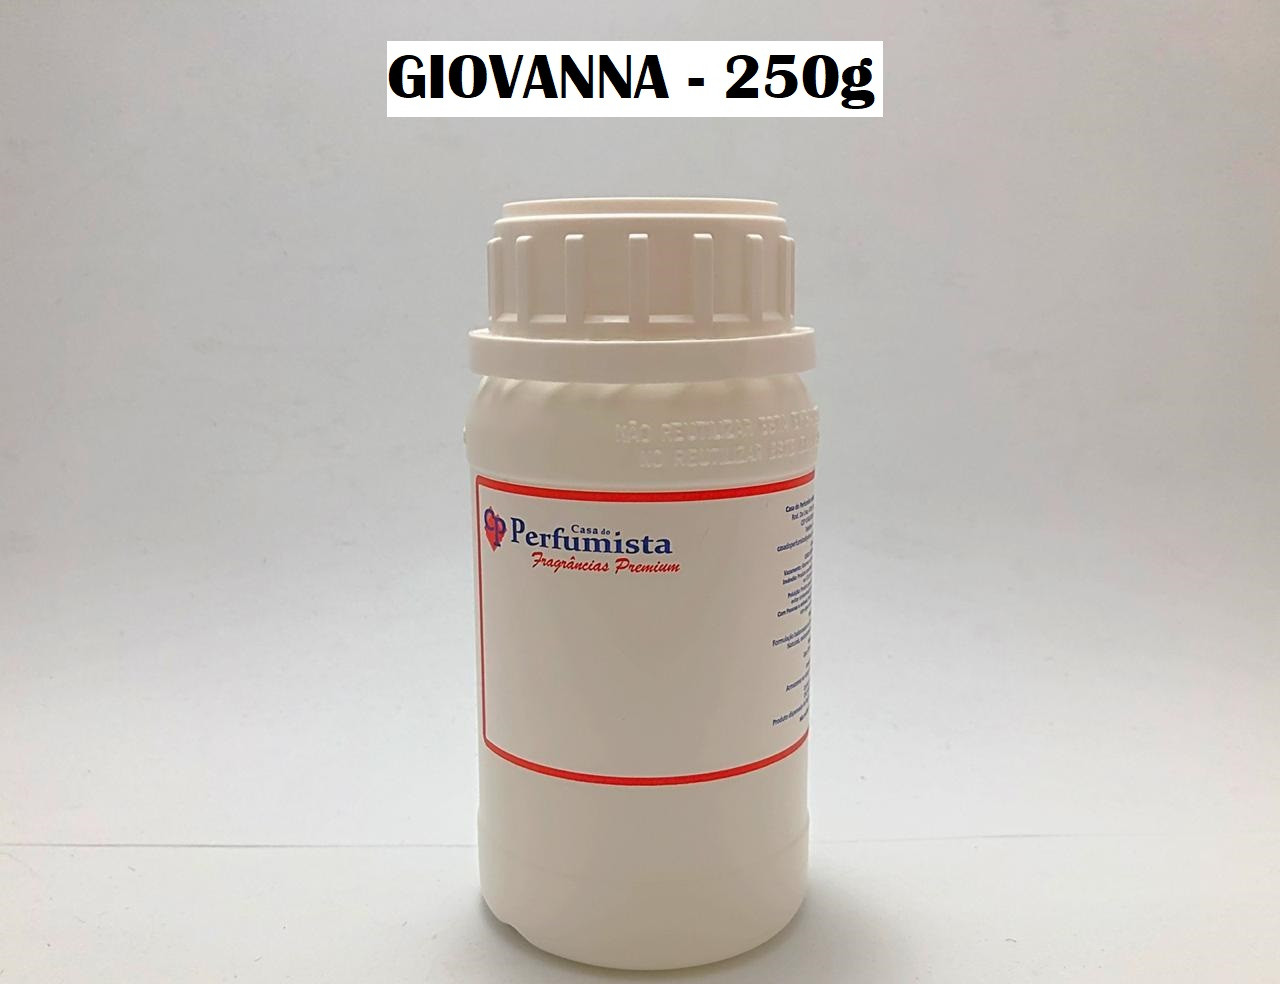 GIOVANNA - 250g